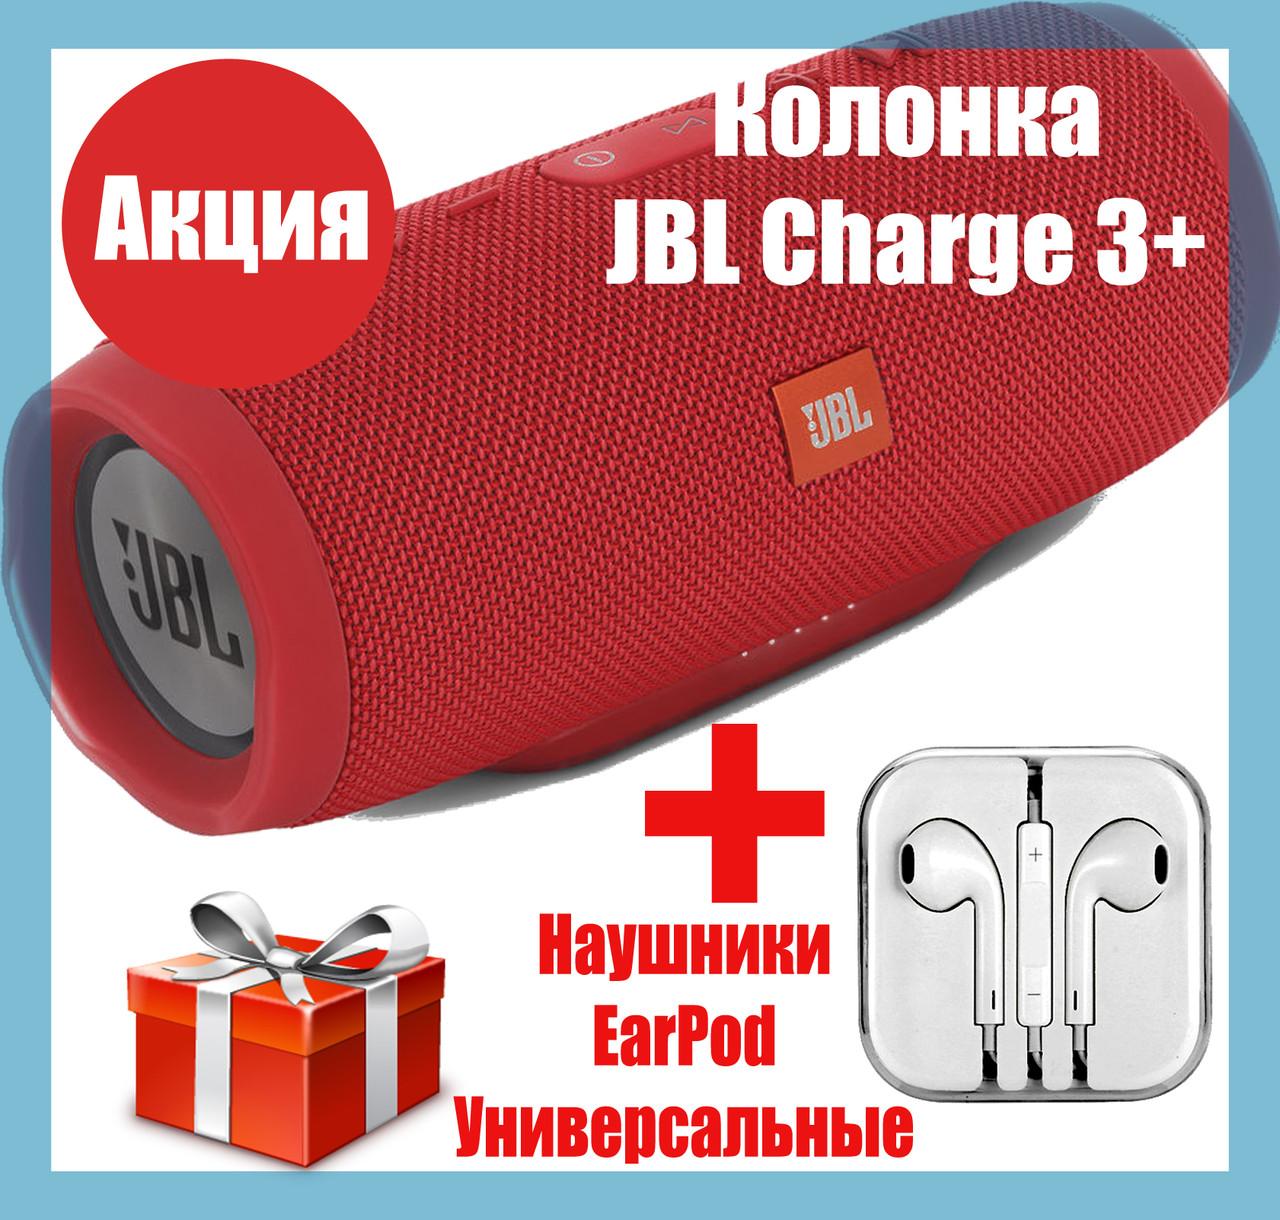 Колонка JBL Charge 3+ Bluetooth, FM MP3 AUX USB microSD PowerBank 20W Quality Replica Красная